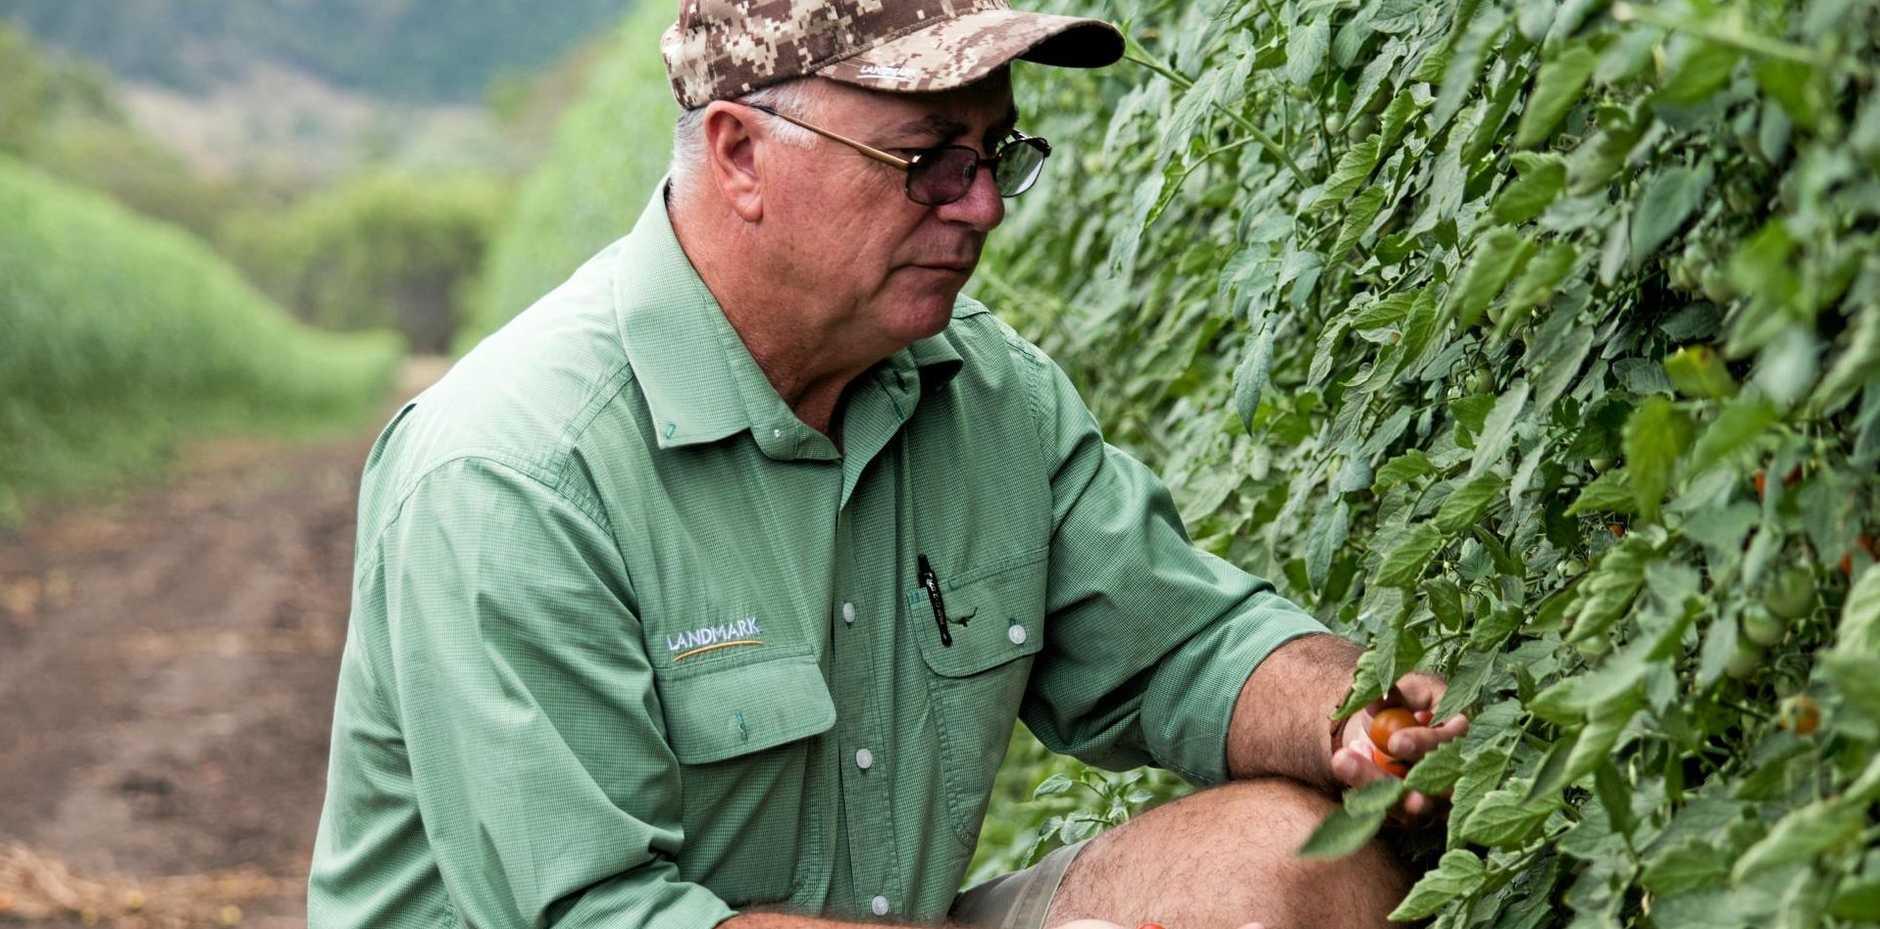 DOUBLE CHECKING: Landmark agronomist Nev Watts checks on local tomato vines for any irregular pests and viruses.